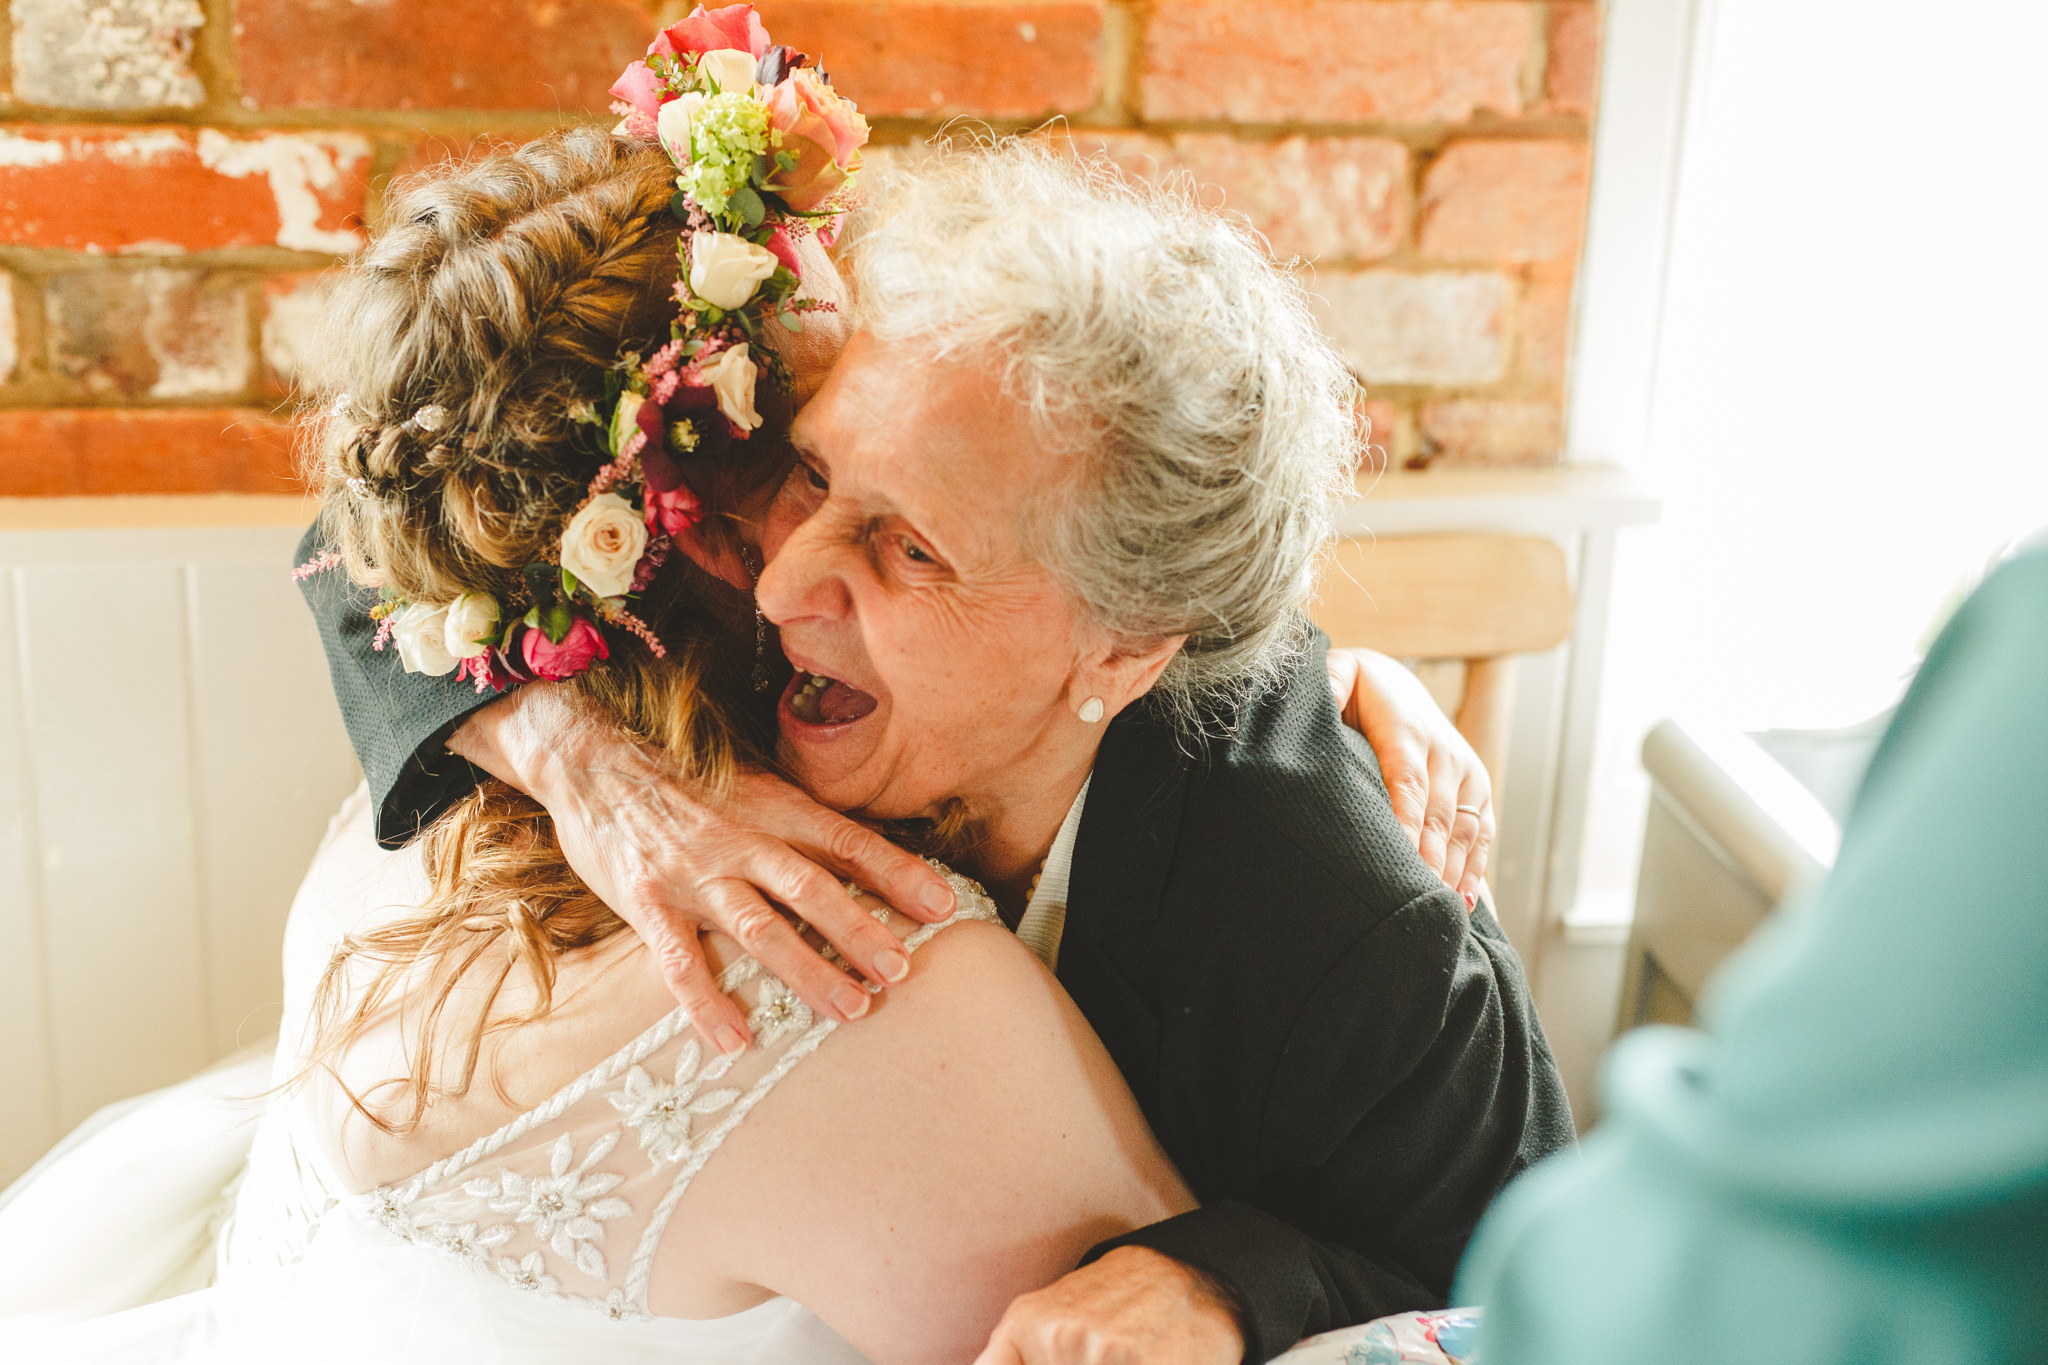 derbyshire-wedding-photographer-march-april-31.jpg